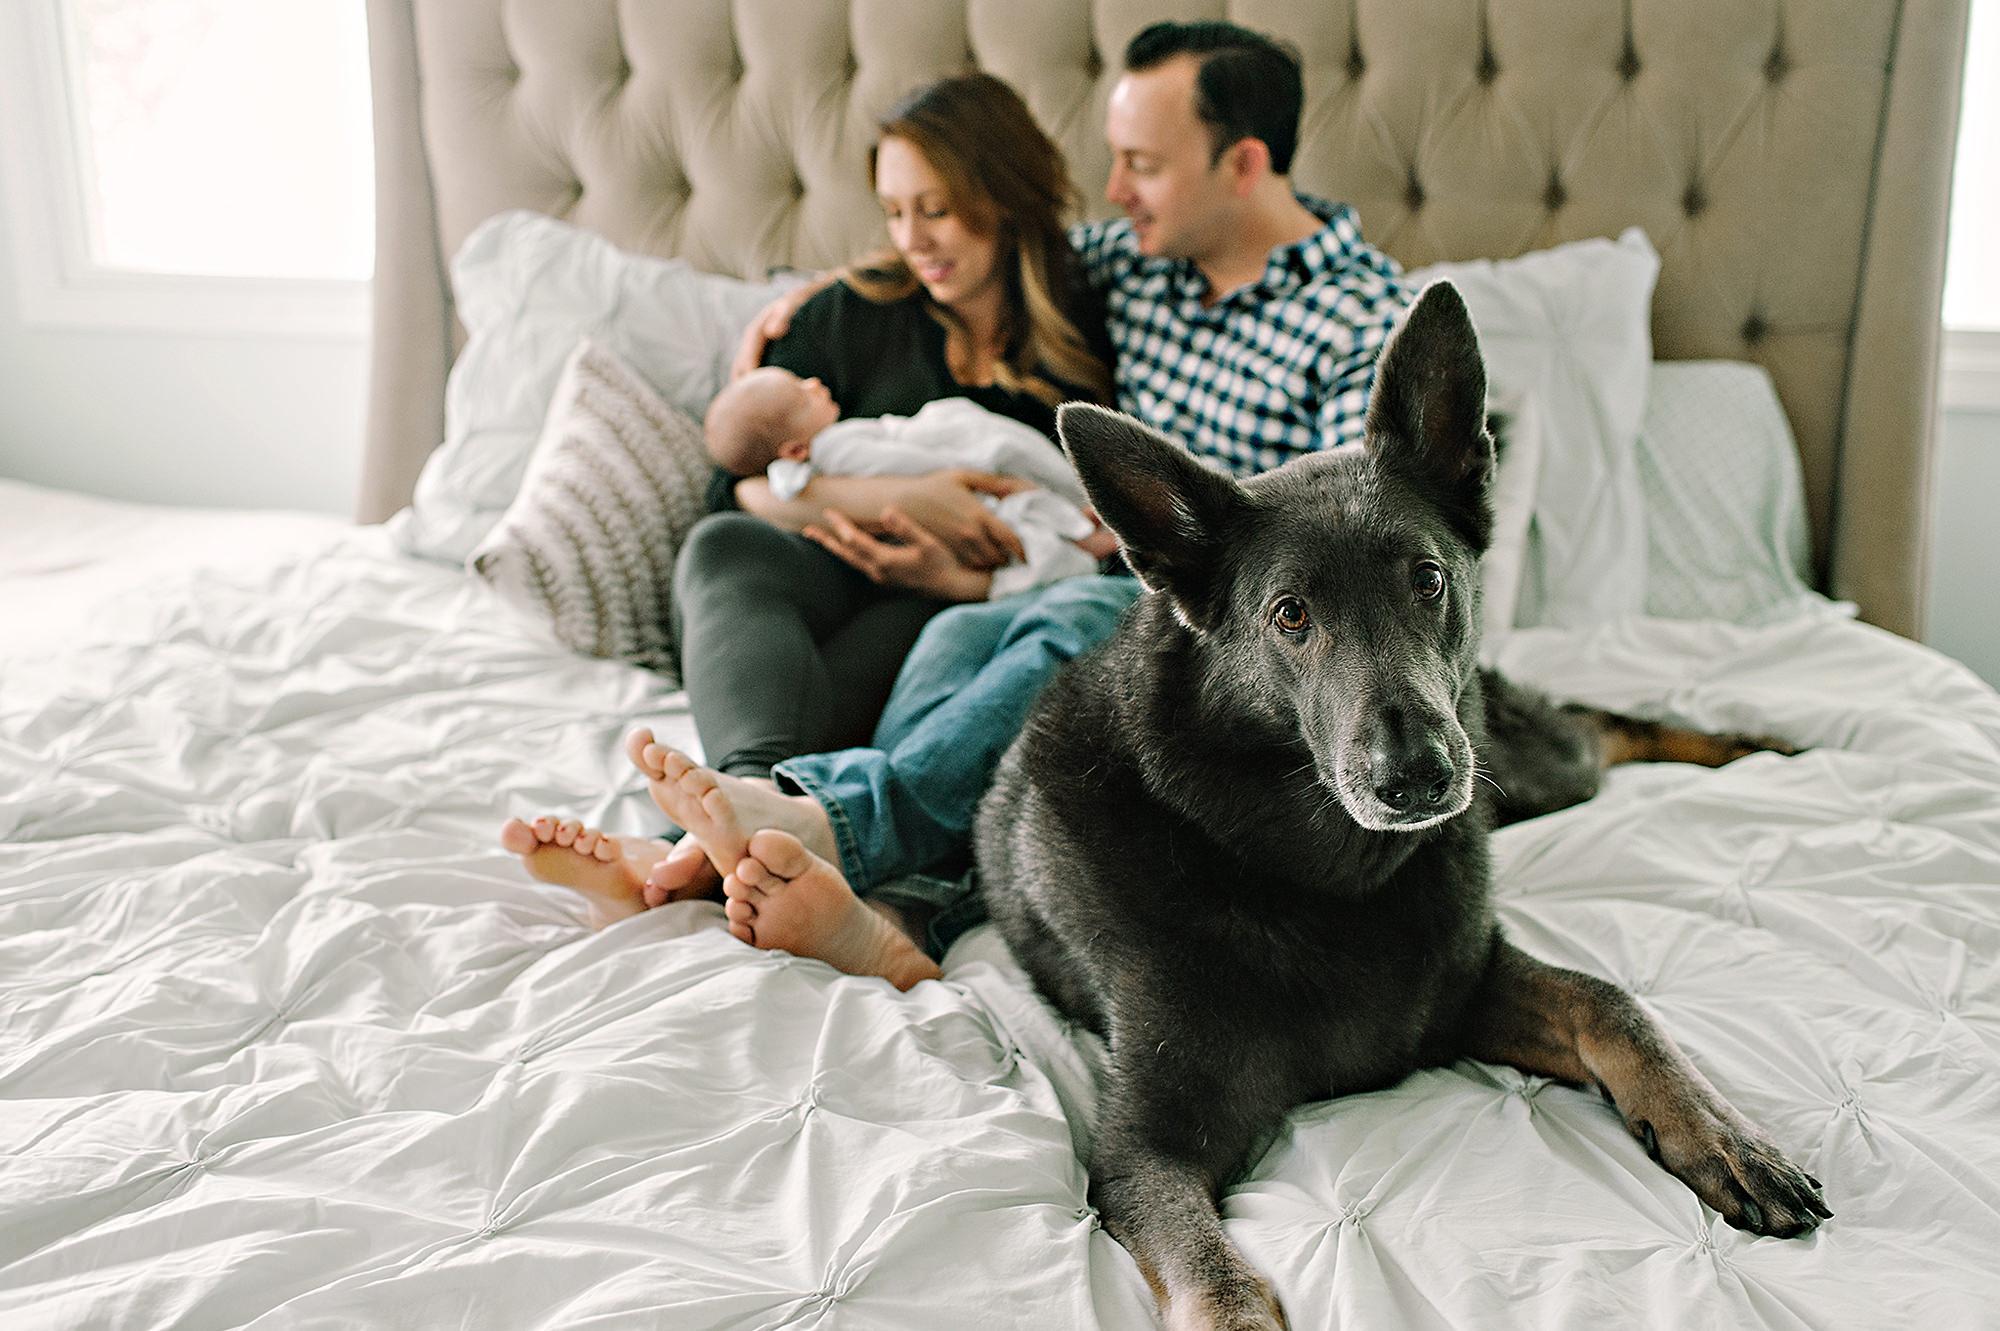 Family-newborn-lifestyle-photography-in-akron-ohio